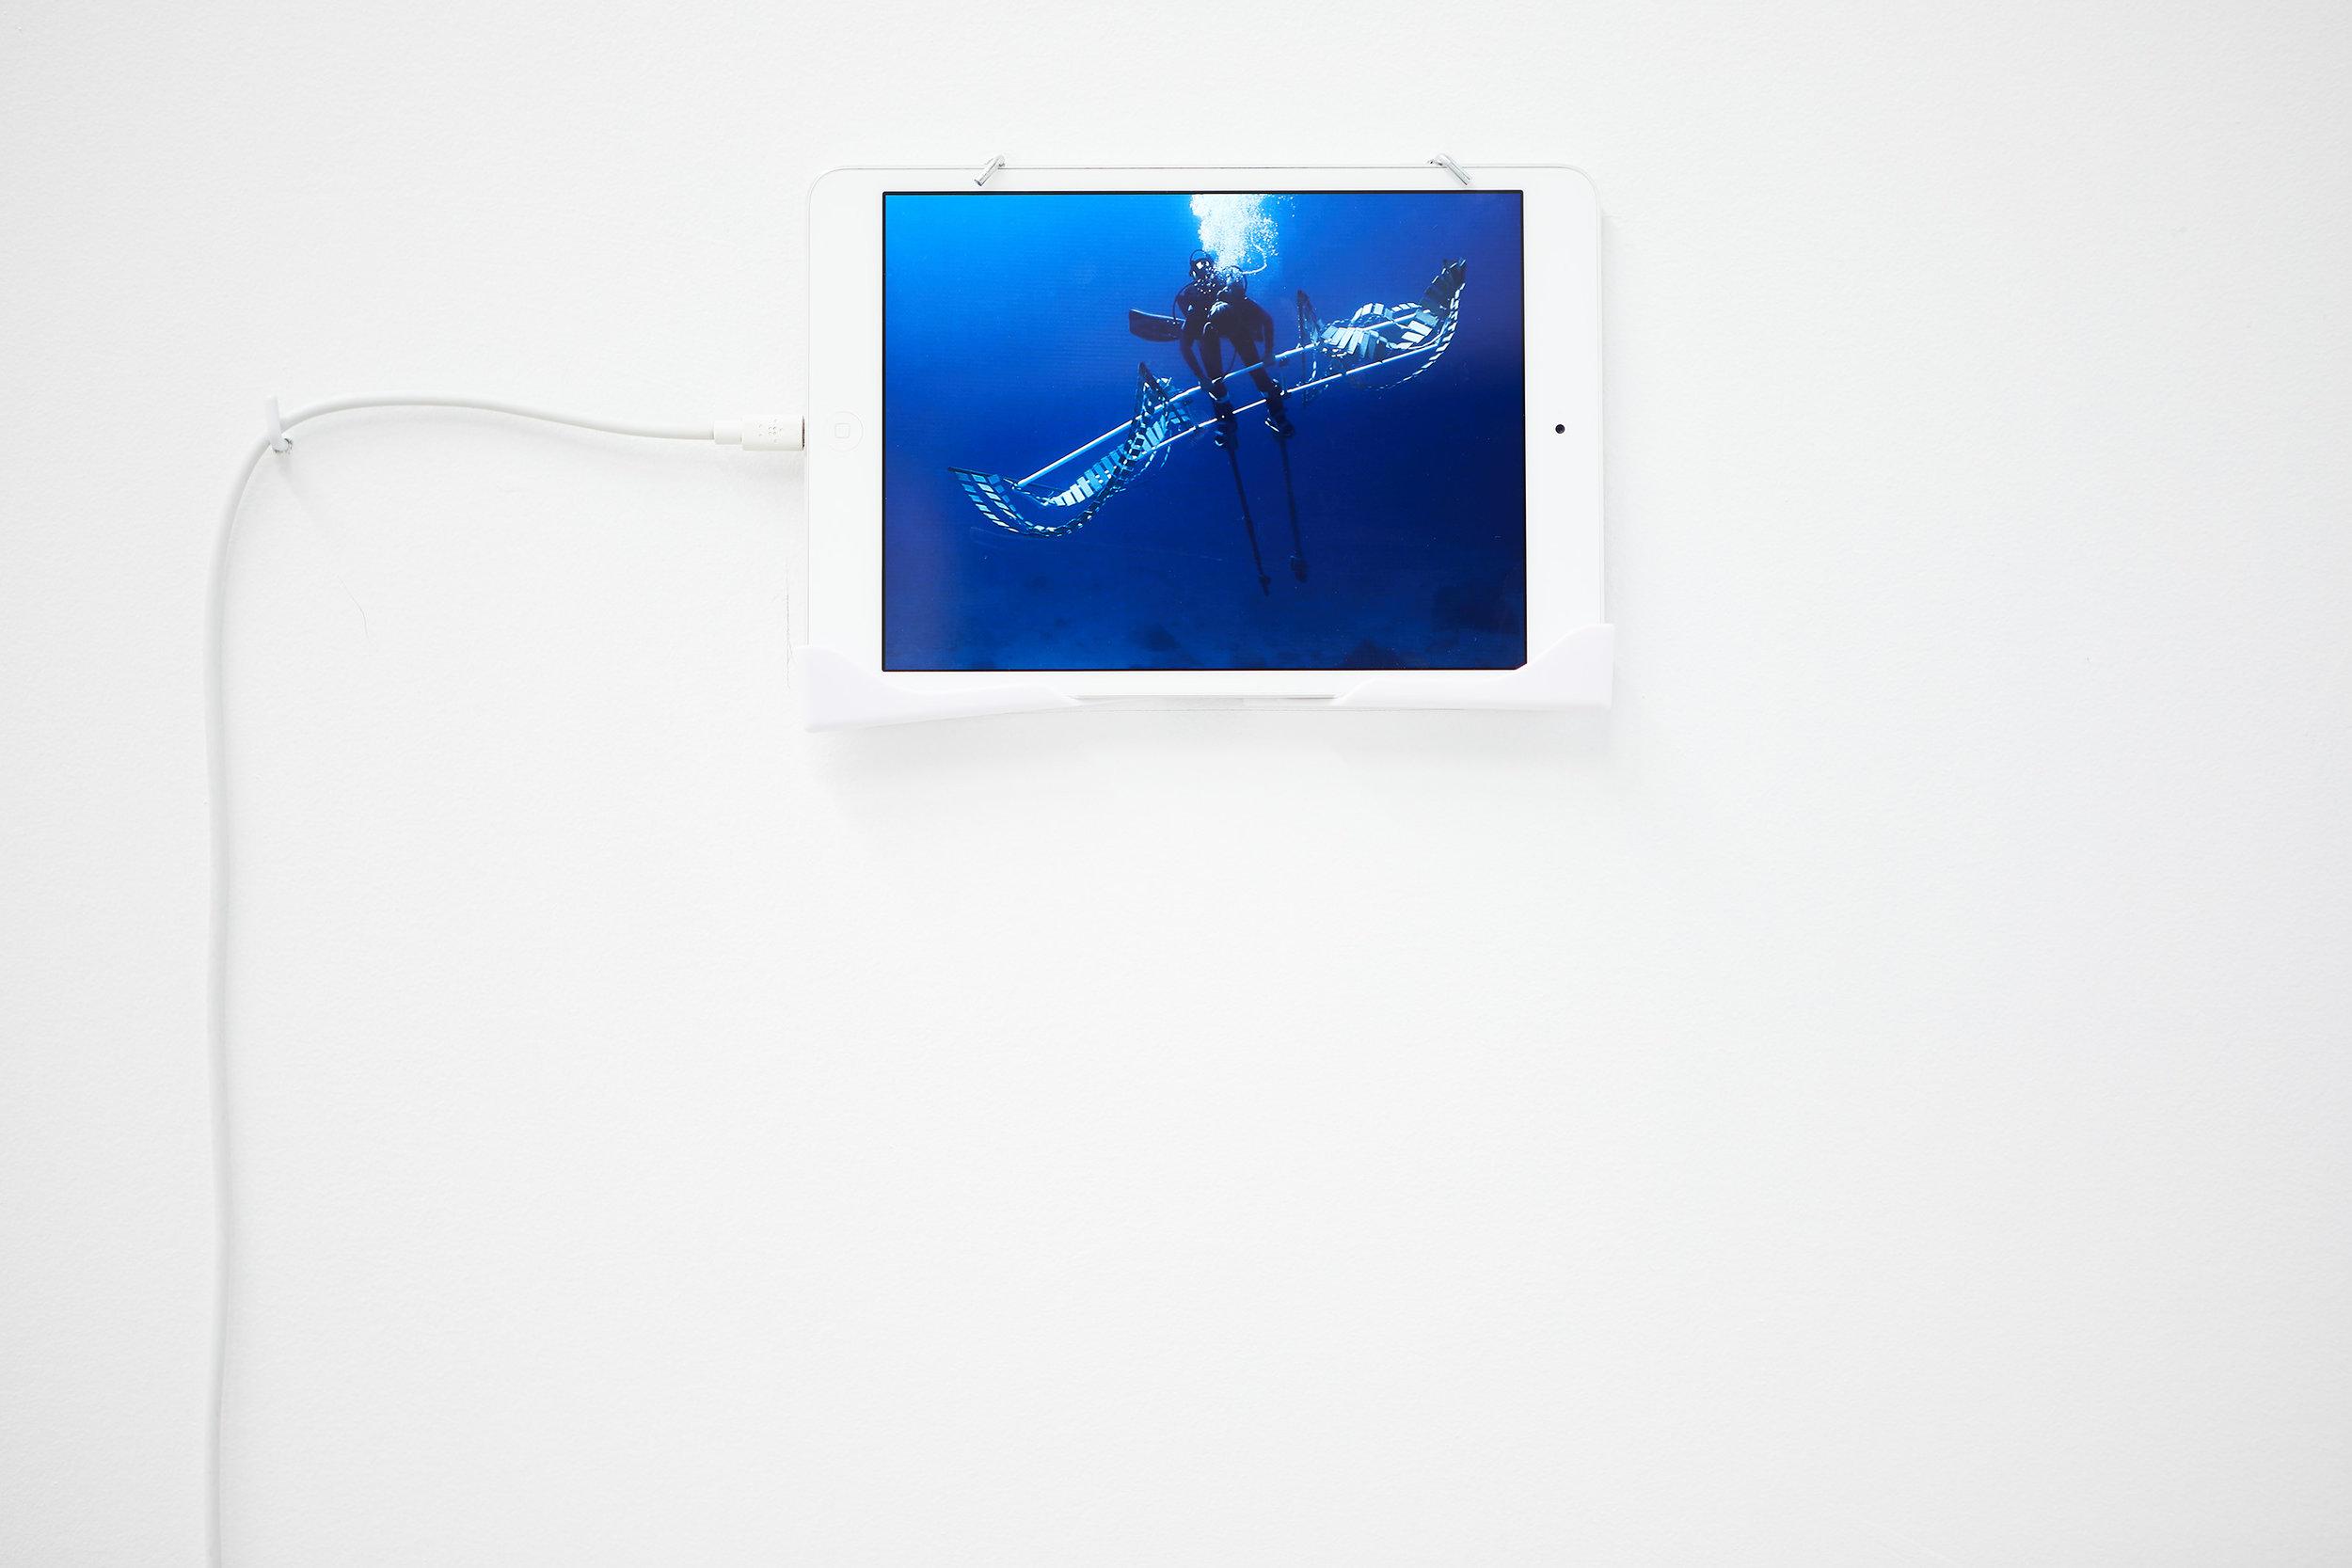 FORLANE 6 STUDIO, DISORIENTED, 2017, vidéo full HD 1920 x 1080, 2.45 min, Ed. 1/3